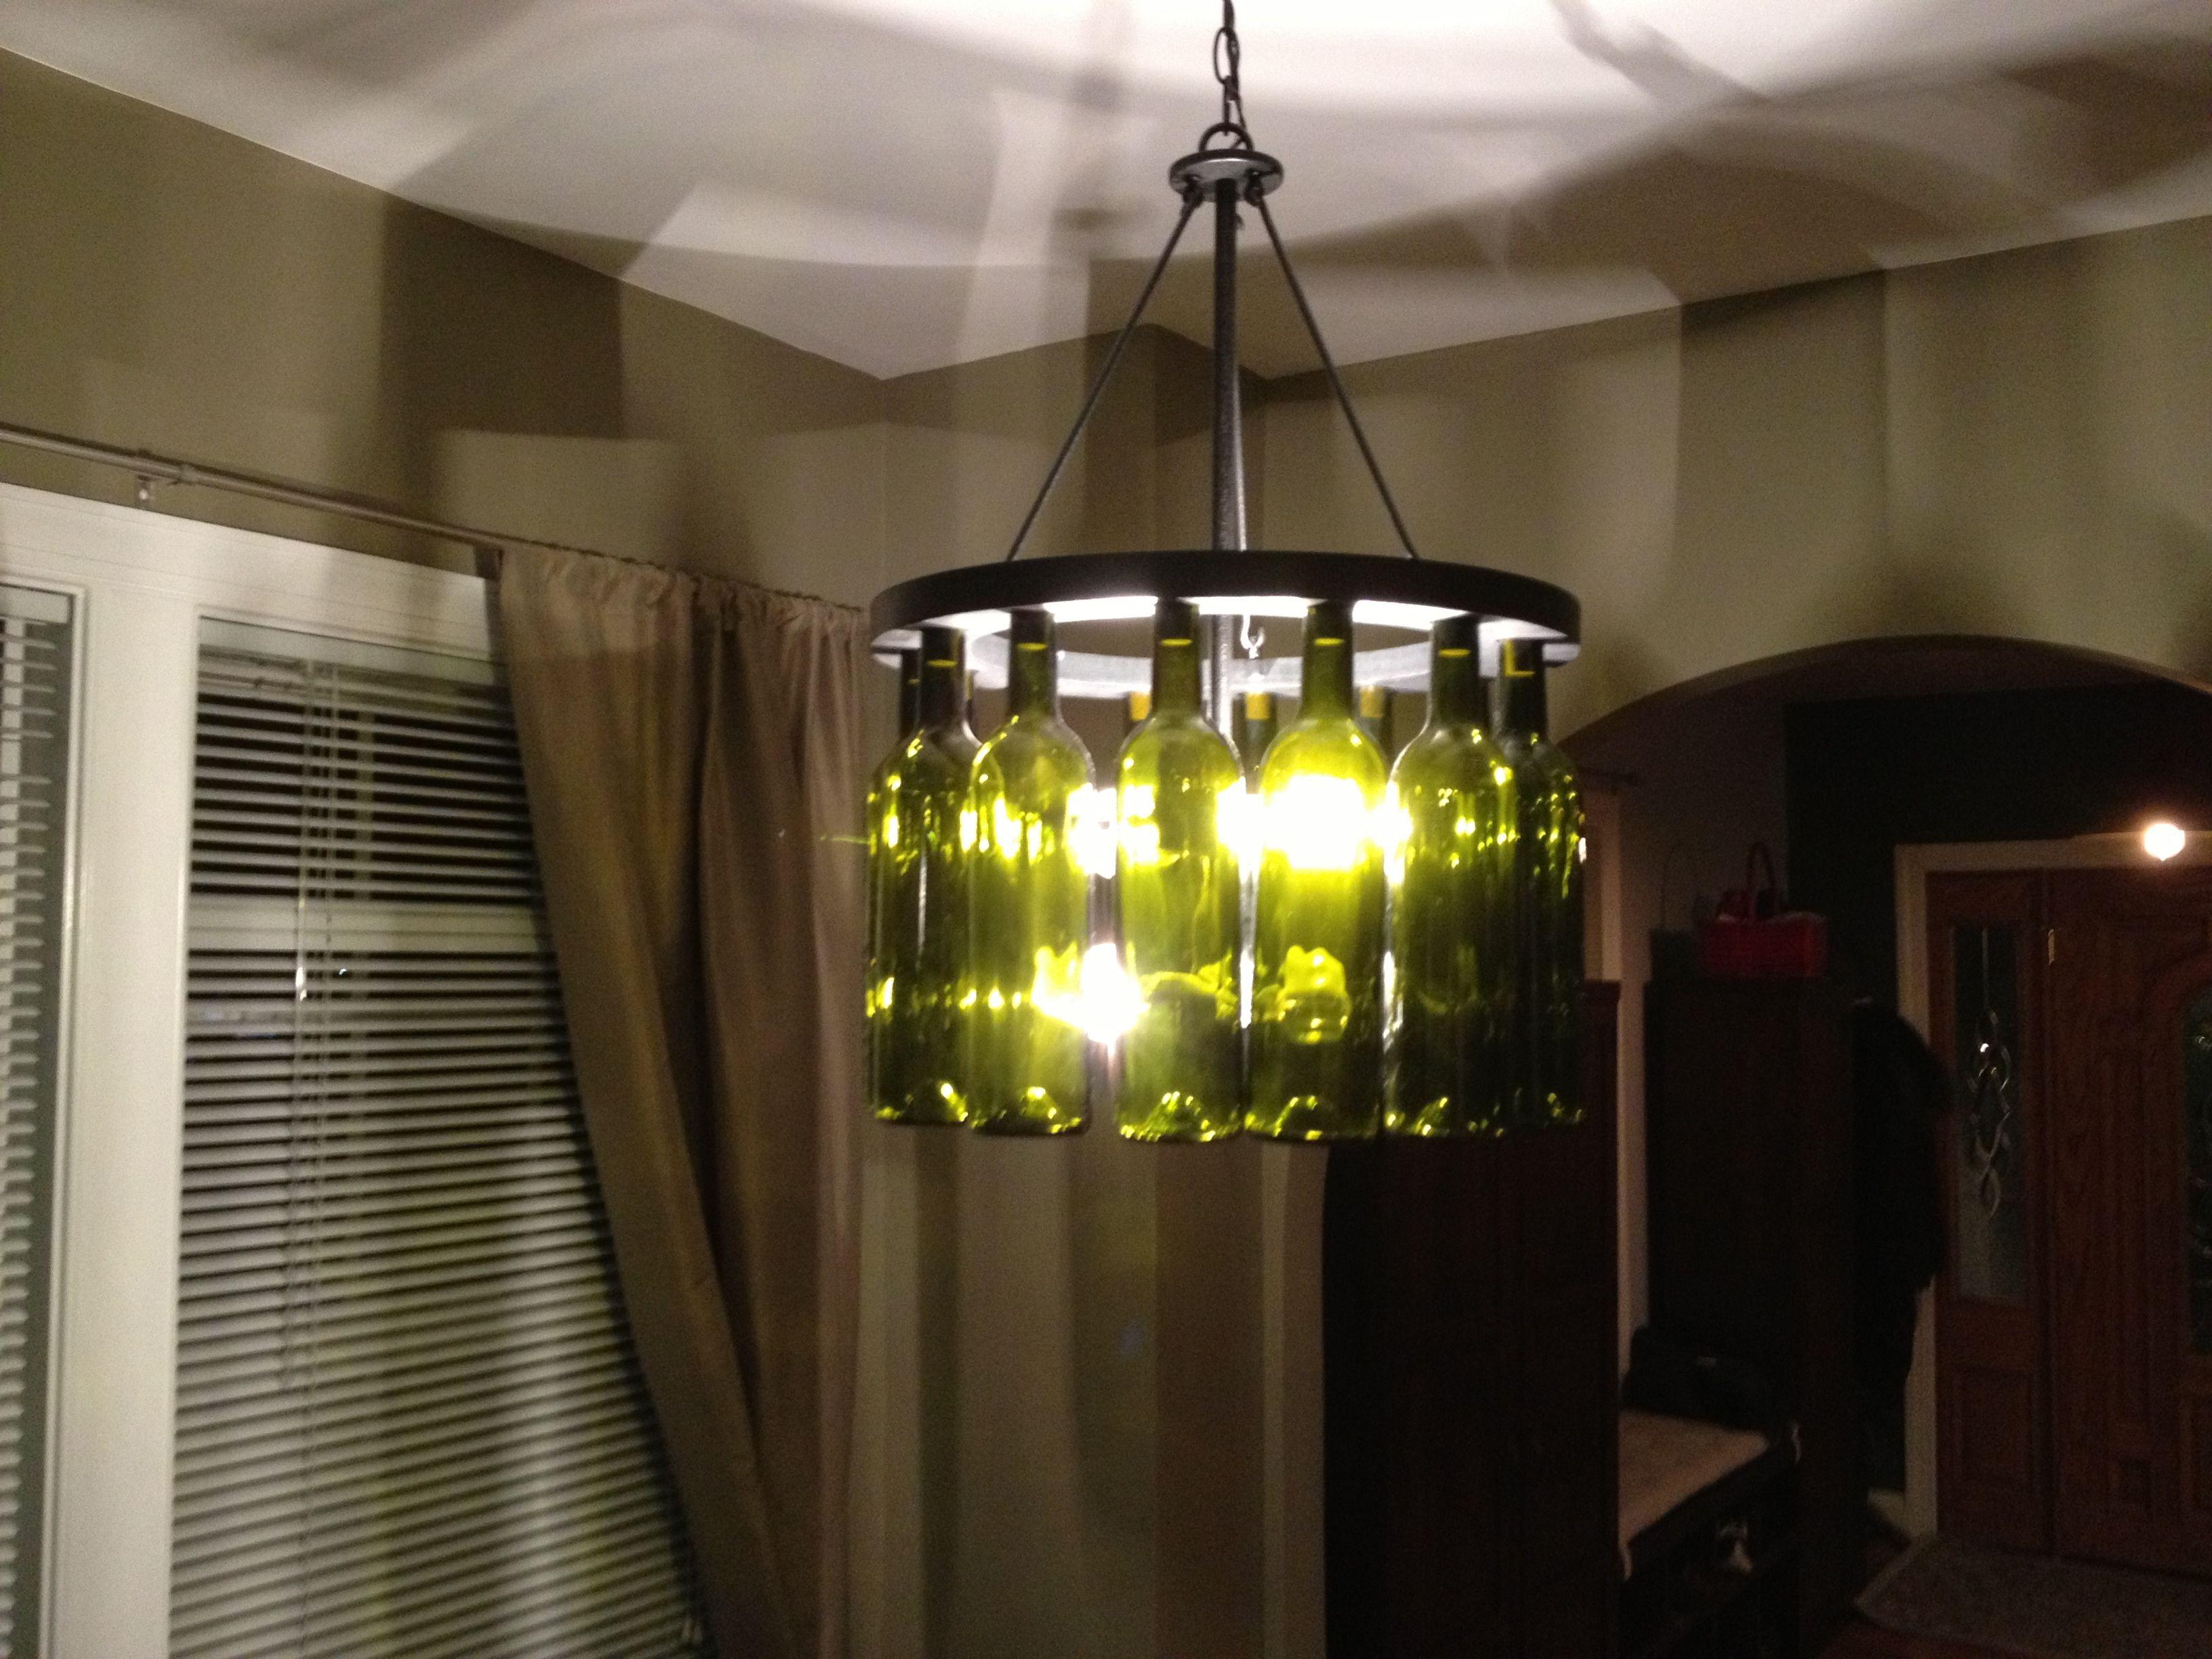 Wine bottle light fixtures around the house pinterest - Wine bottle light fixtures ...